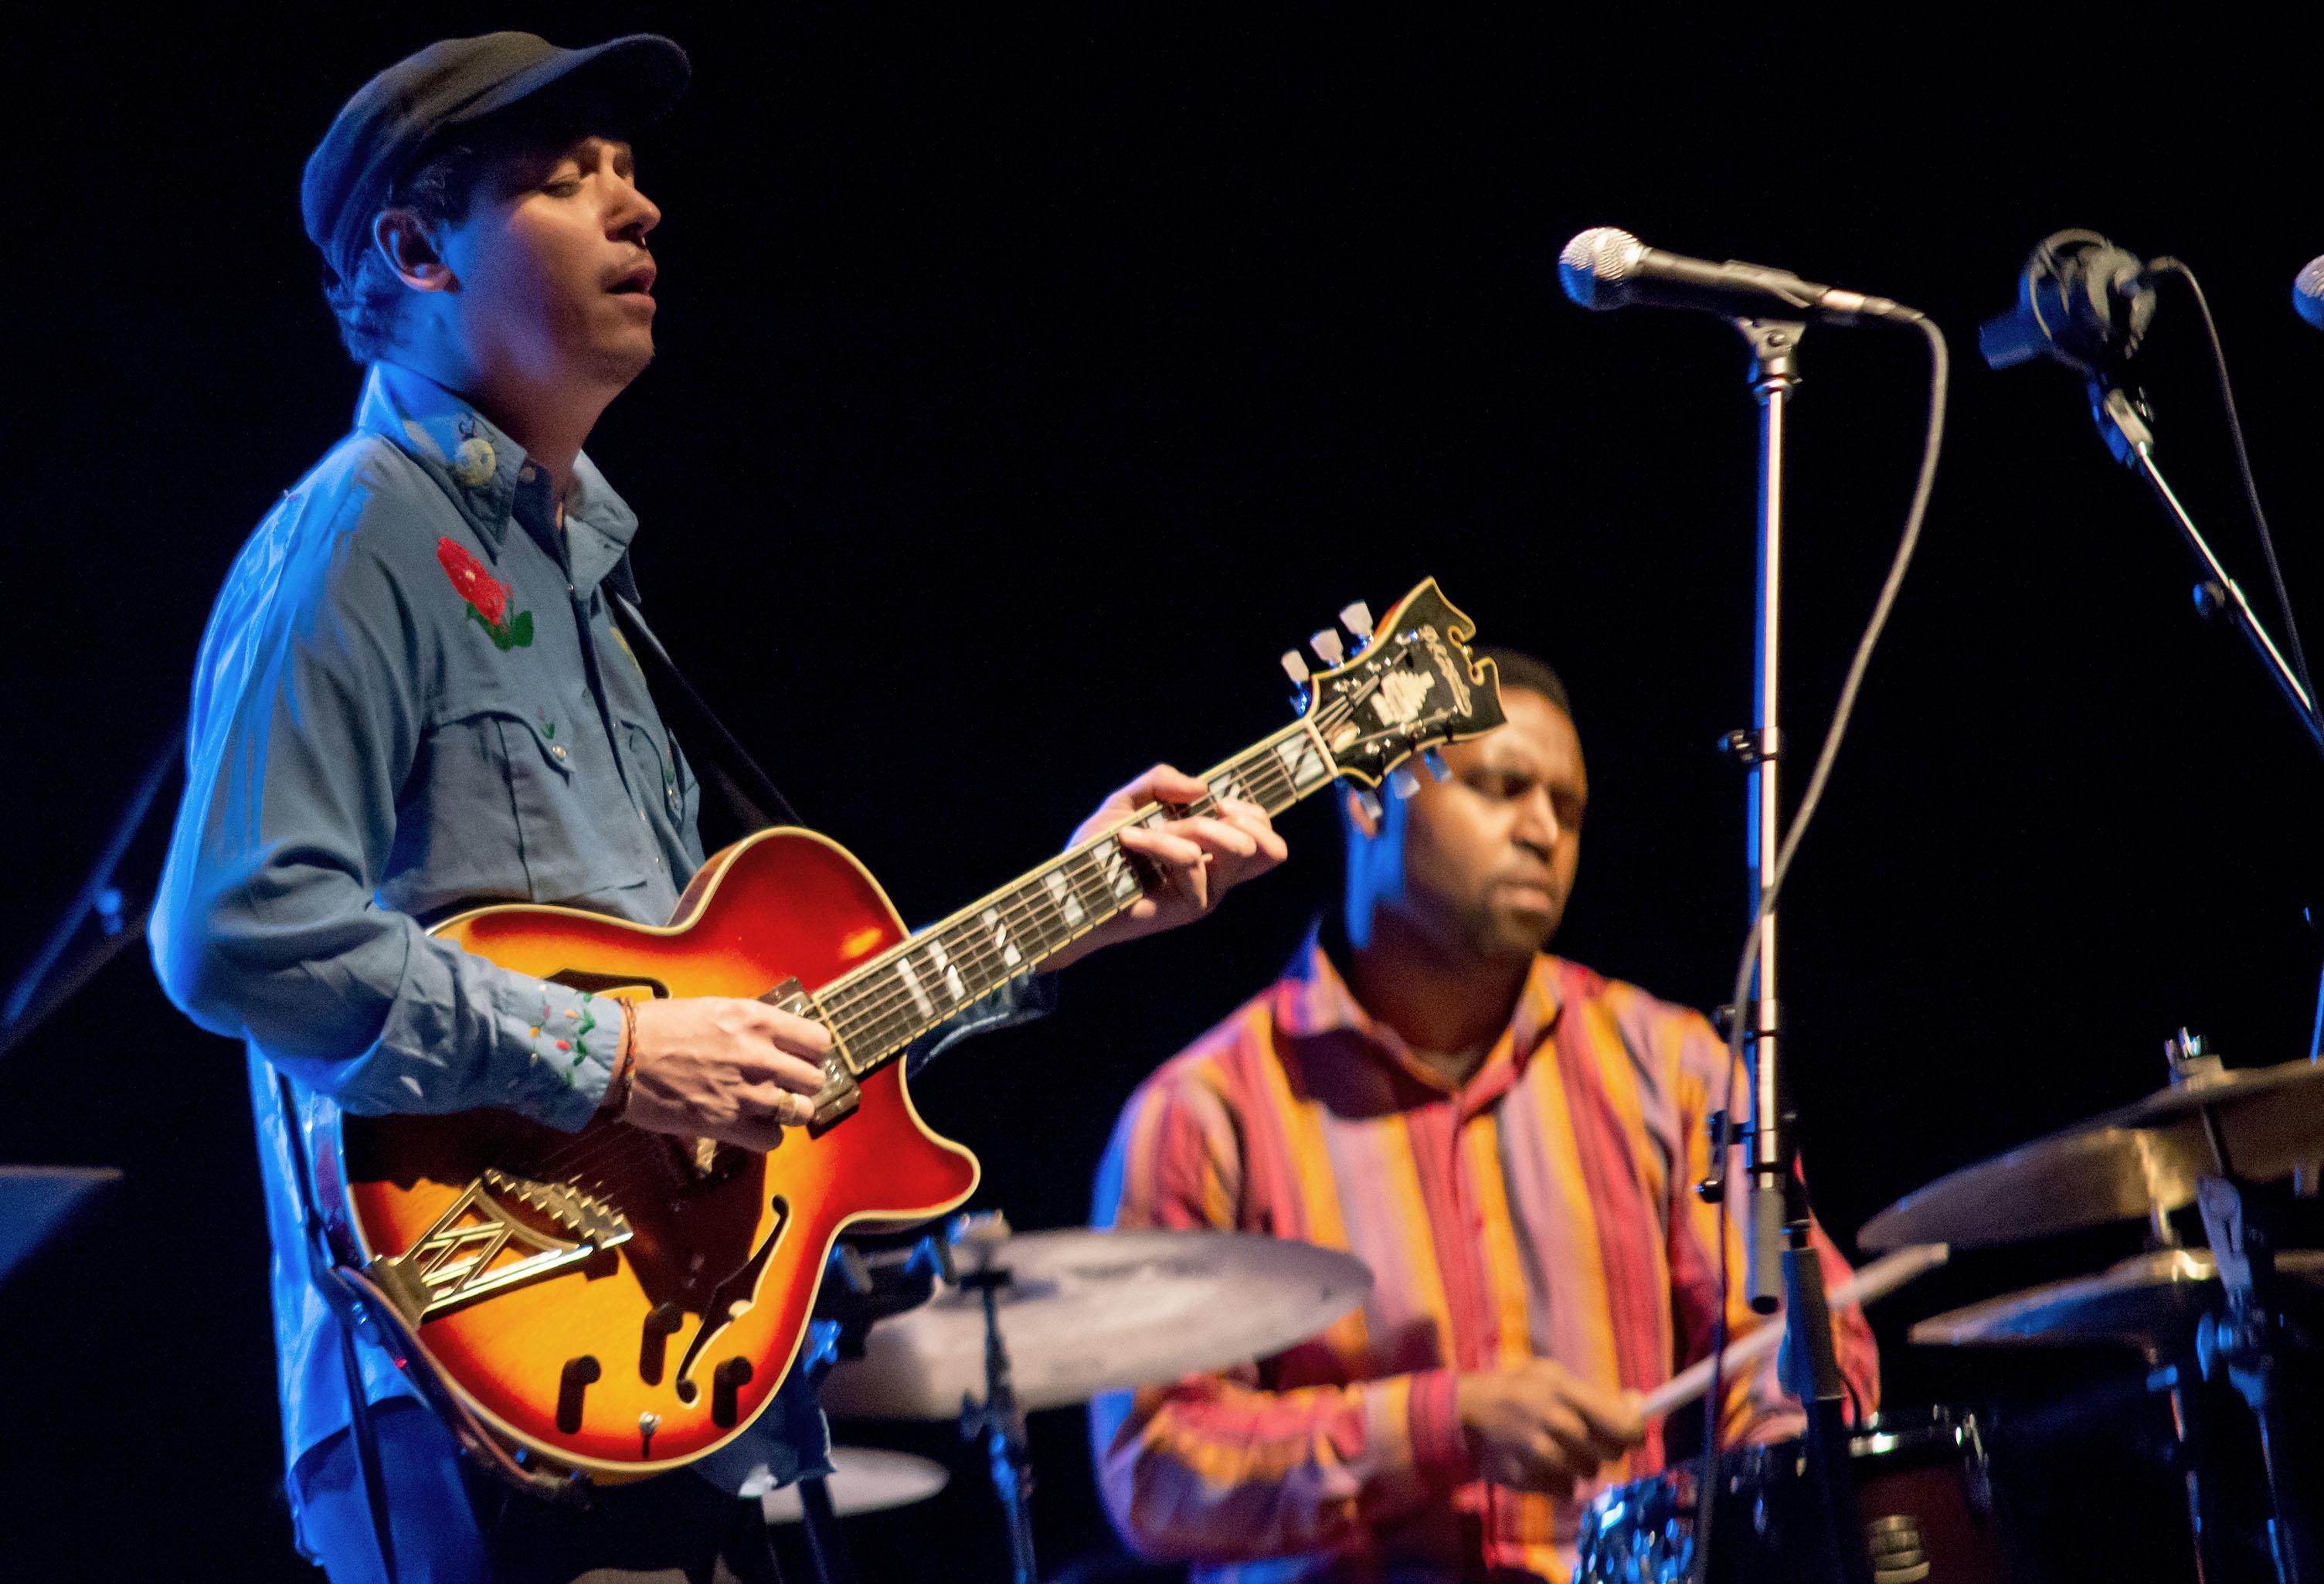 Kurt rosenwinkel new quartet, 2013 montreal jazz festival